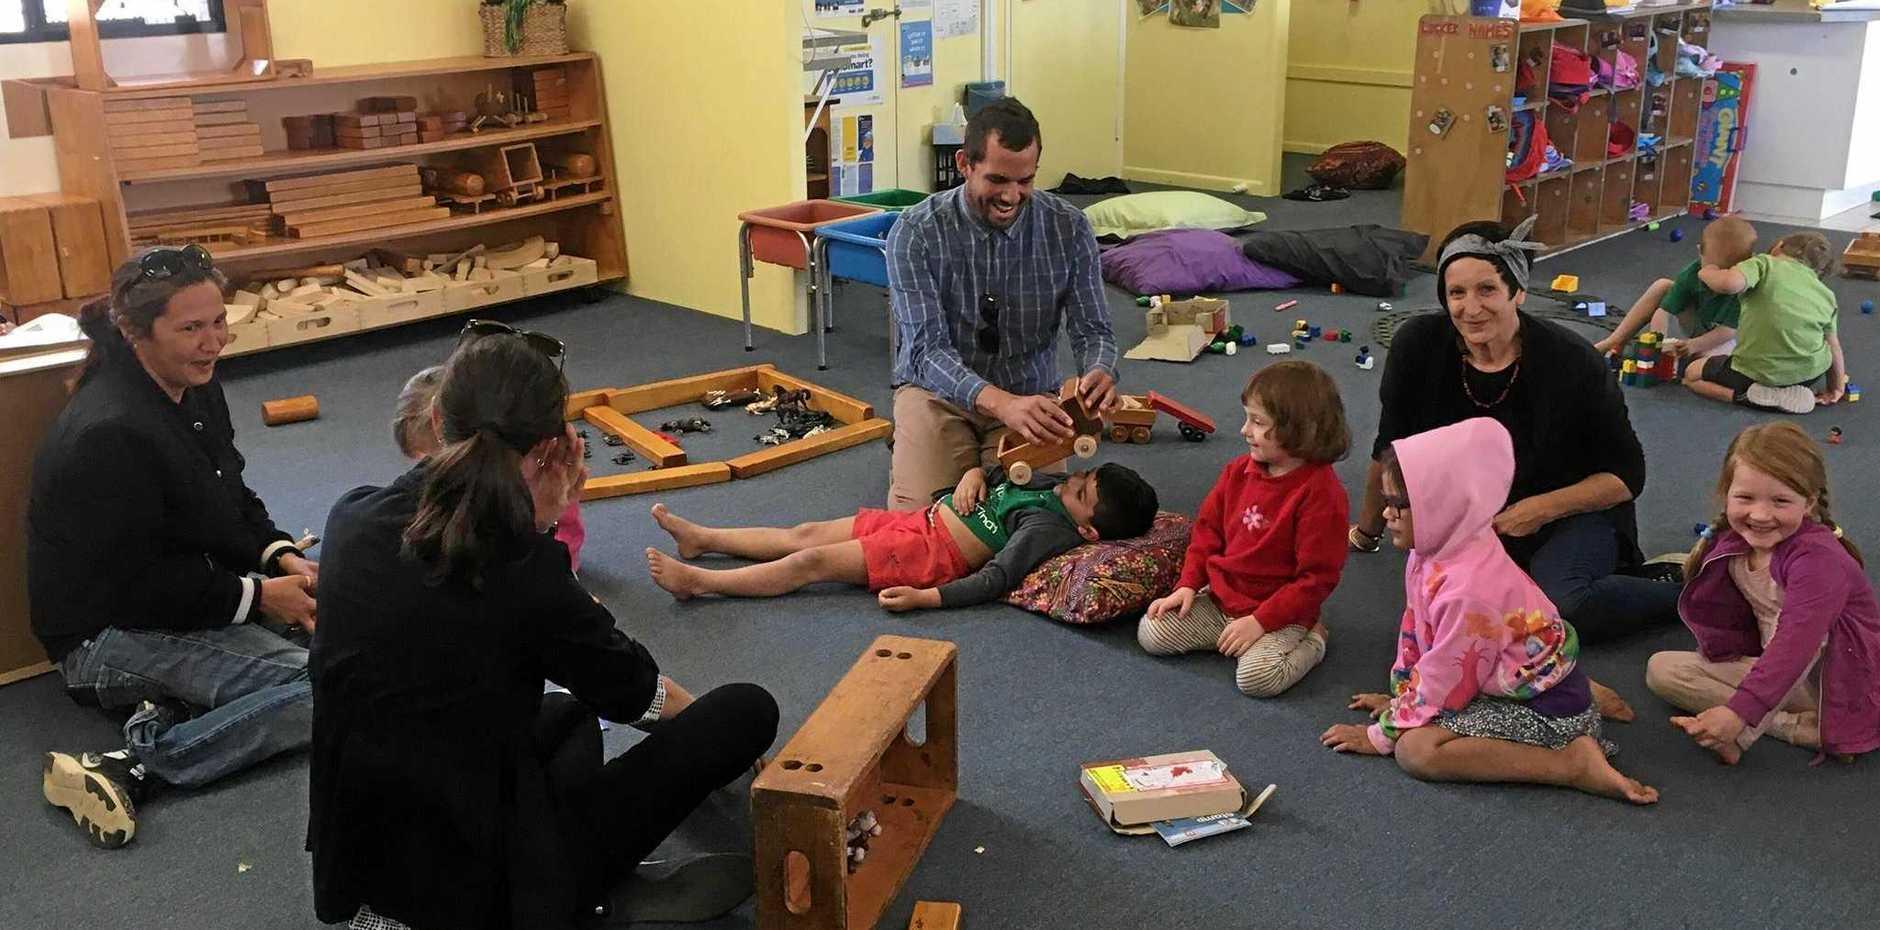 PLAY TIME: Eidsvold State School principal Preston Parter enjoying a playdate at Eidsvold Kindergarten.